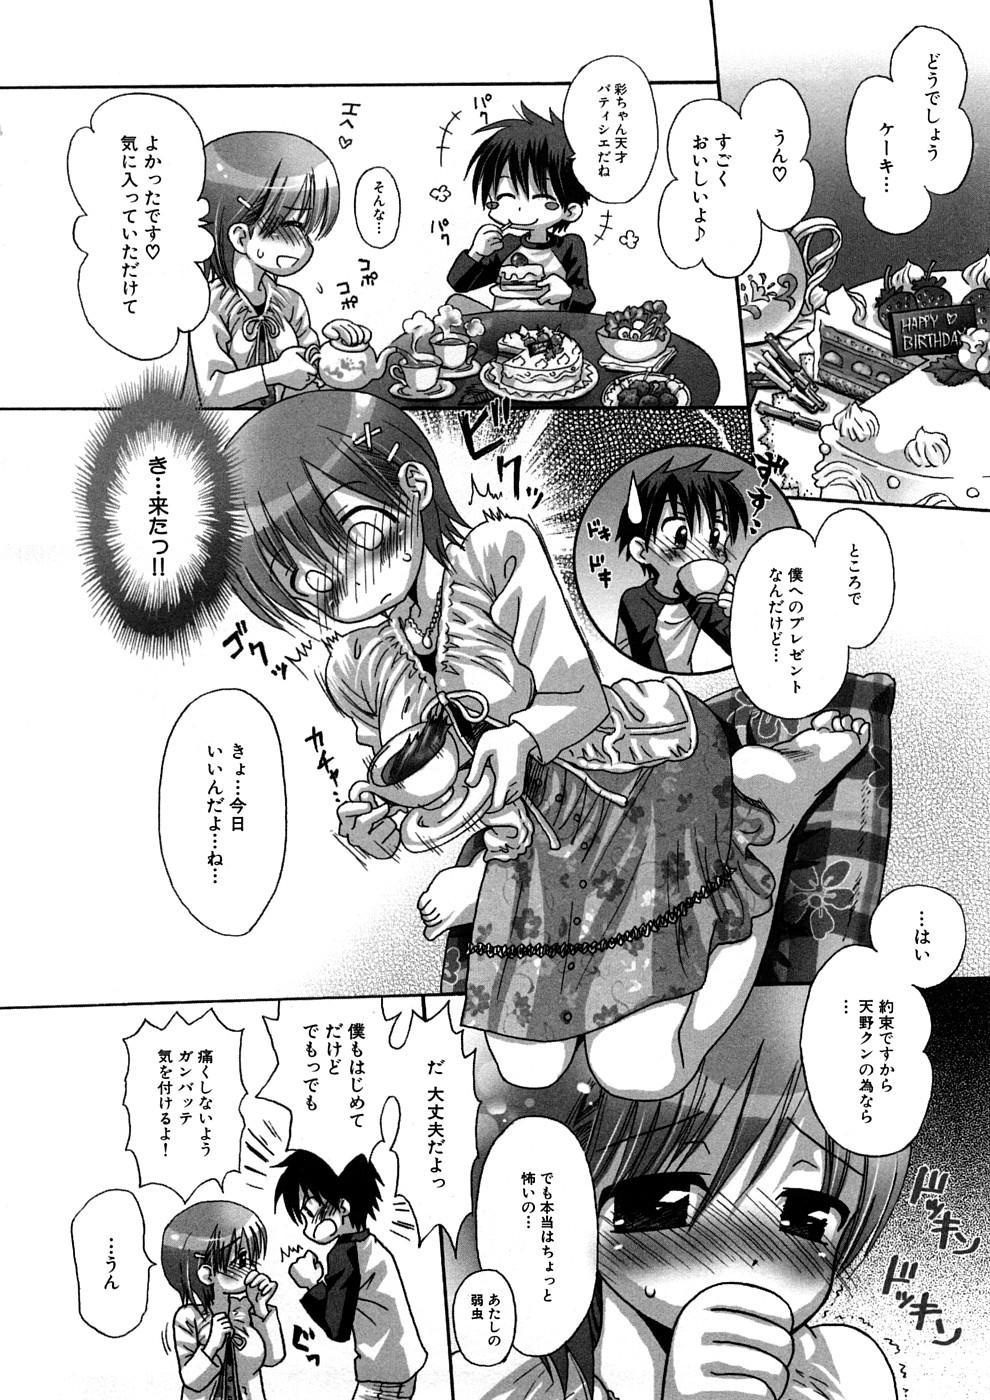 Geki Yaba Anthology Vol. 1 - Naka ni Dashite yo 104